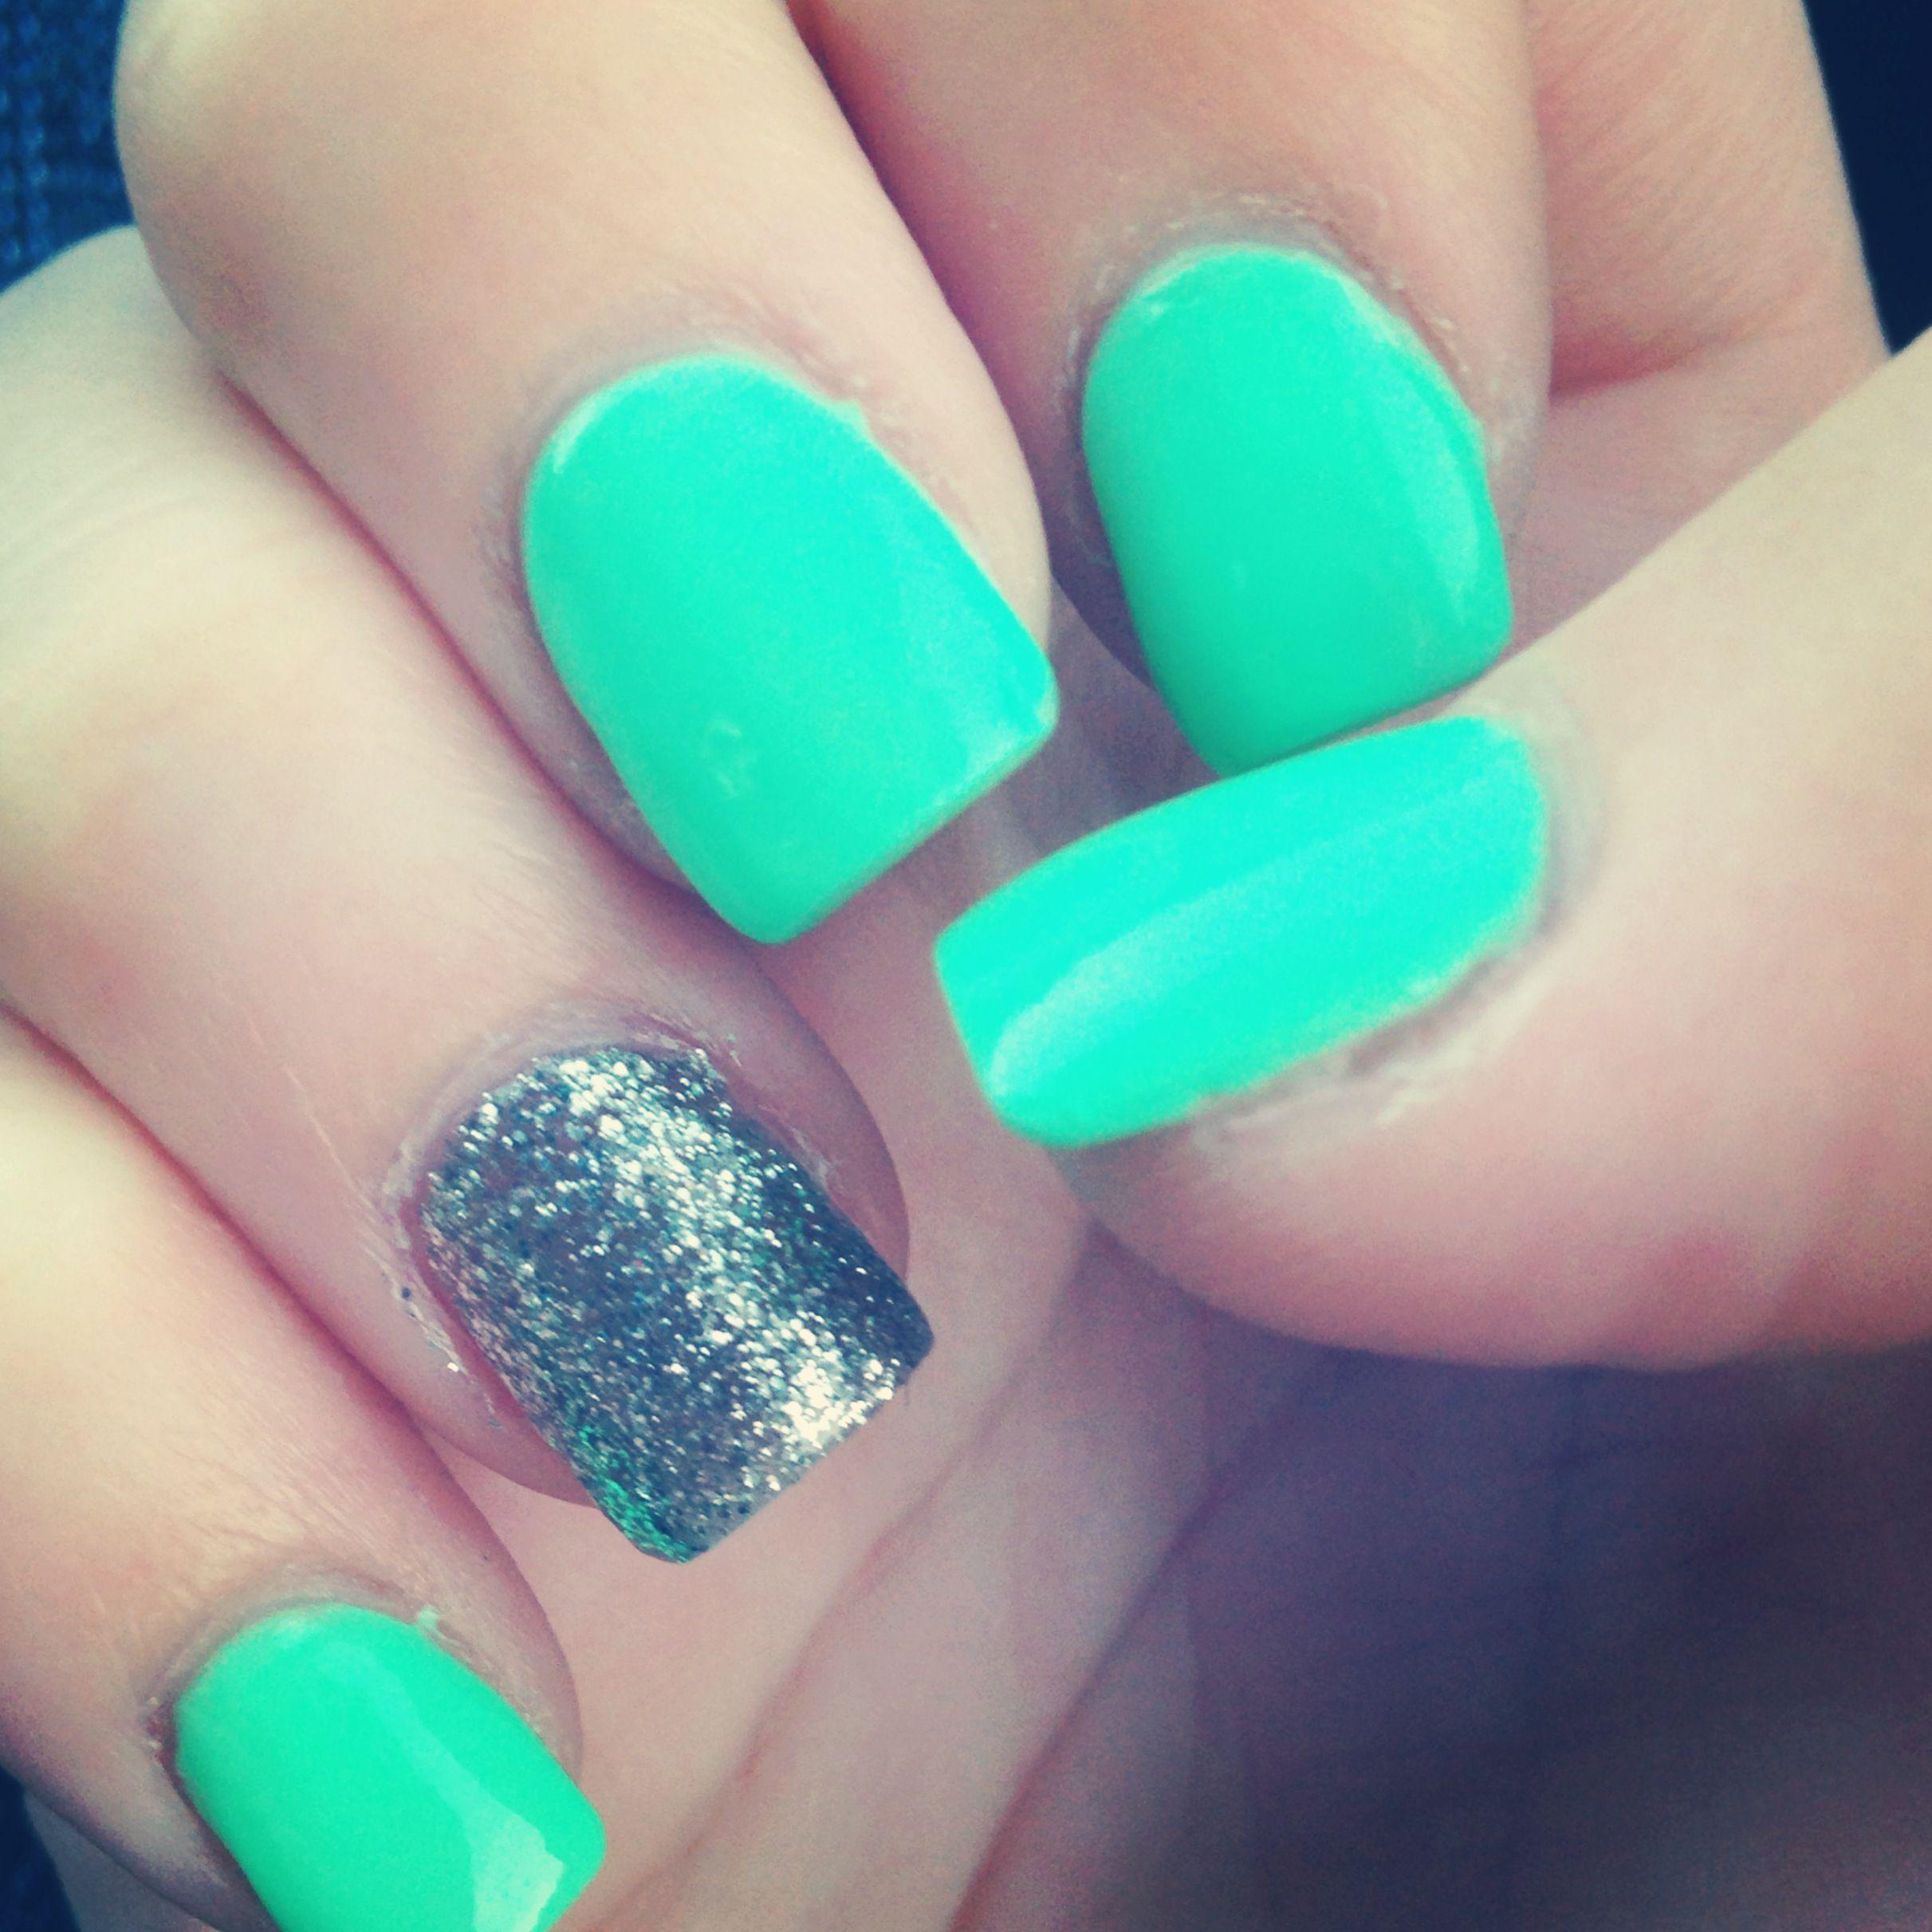 Nails Acrylic Fakenails Nailideas Pretty Silver Glitter Sparkle Sparkles Blue Aqua Teal Green Turquoise Gorg Fall Acrylic Nails Teal Nails Nails